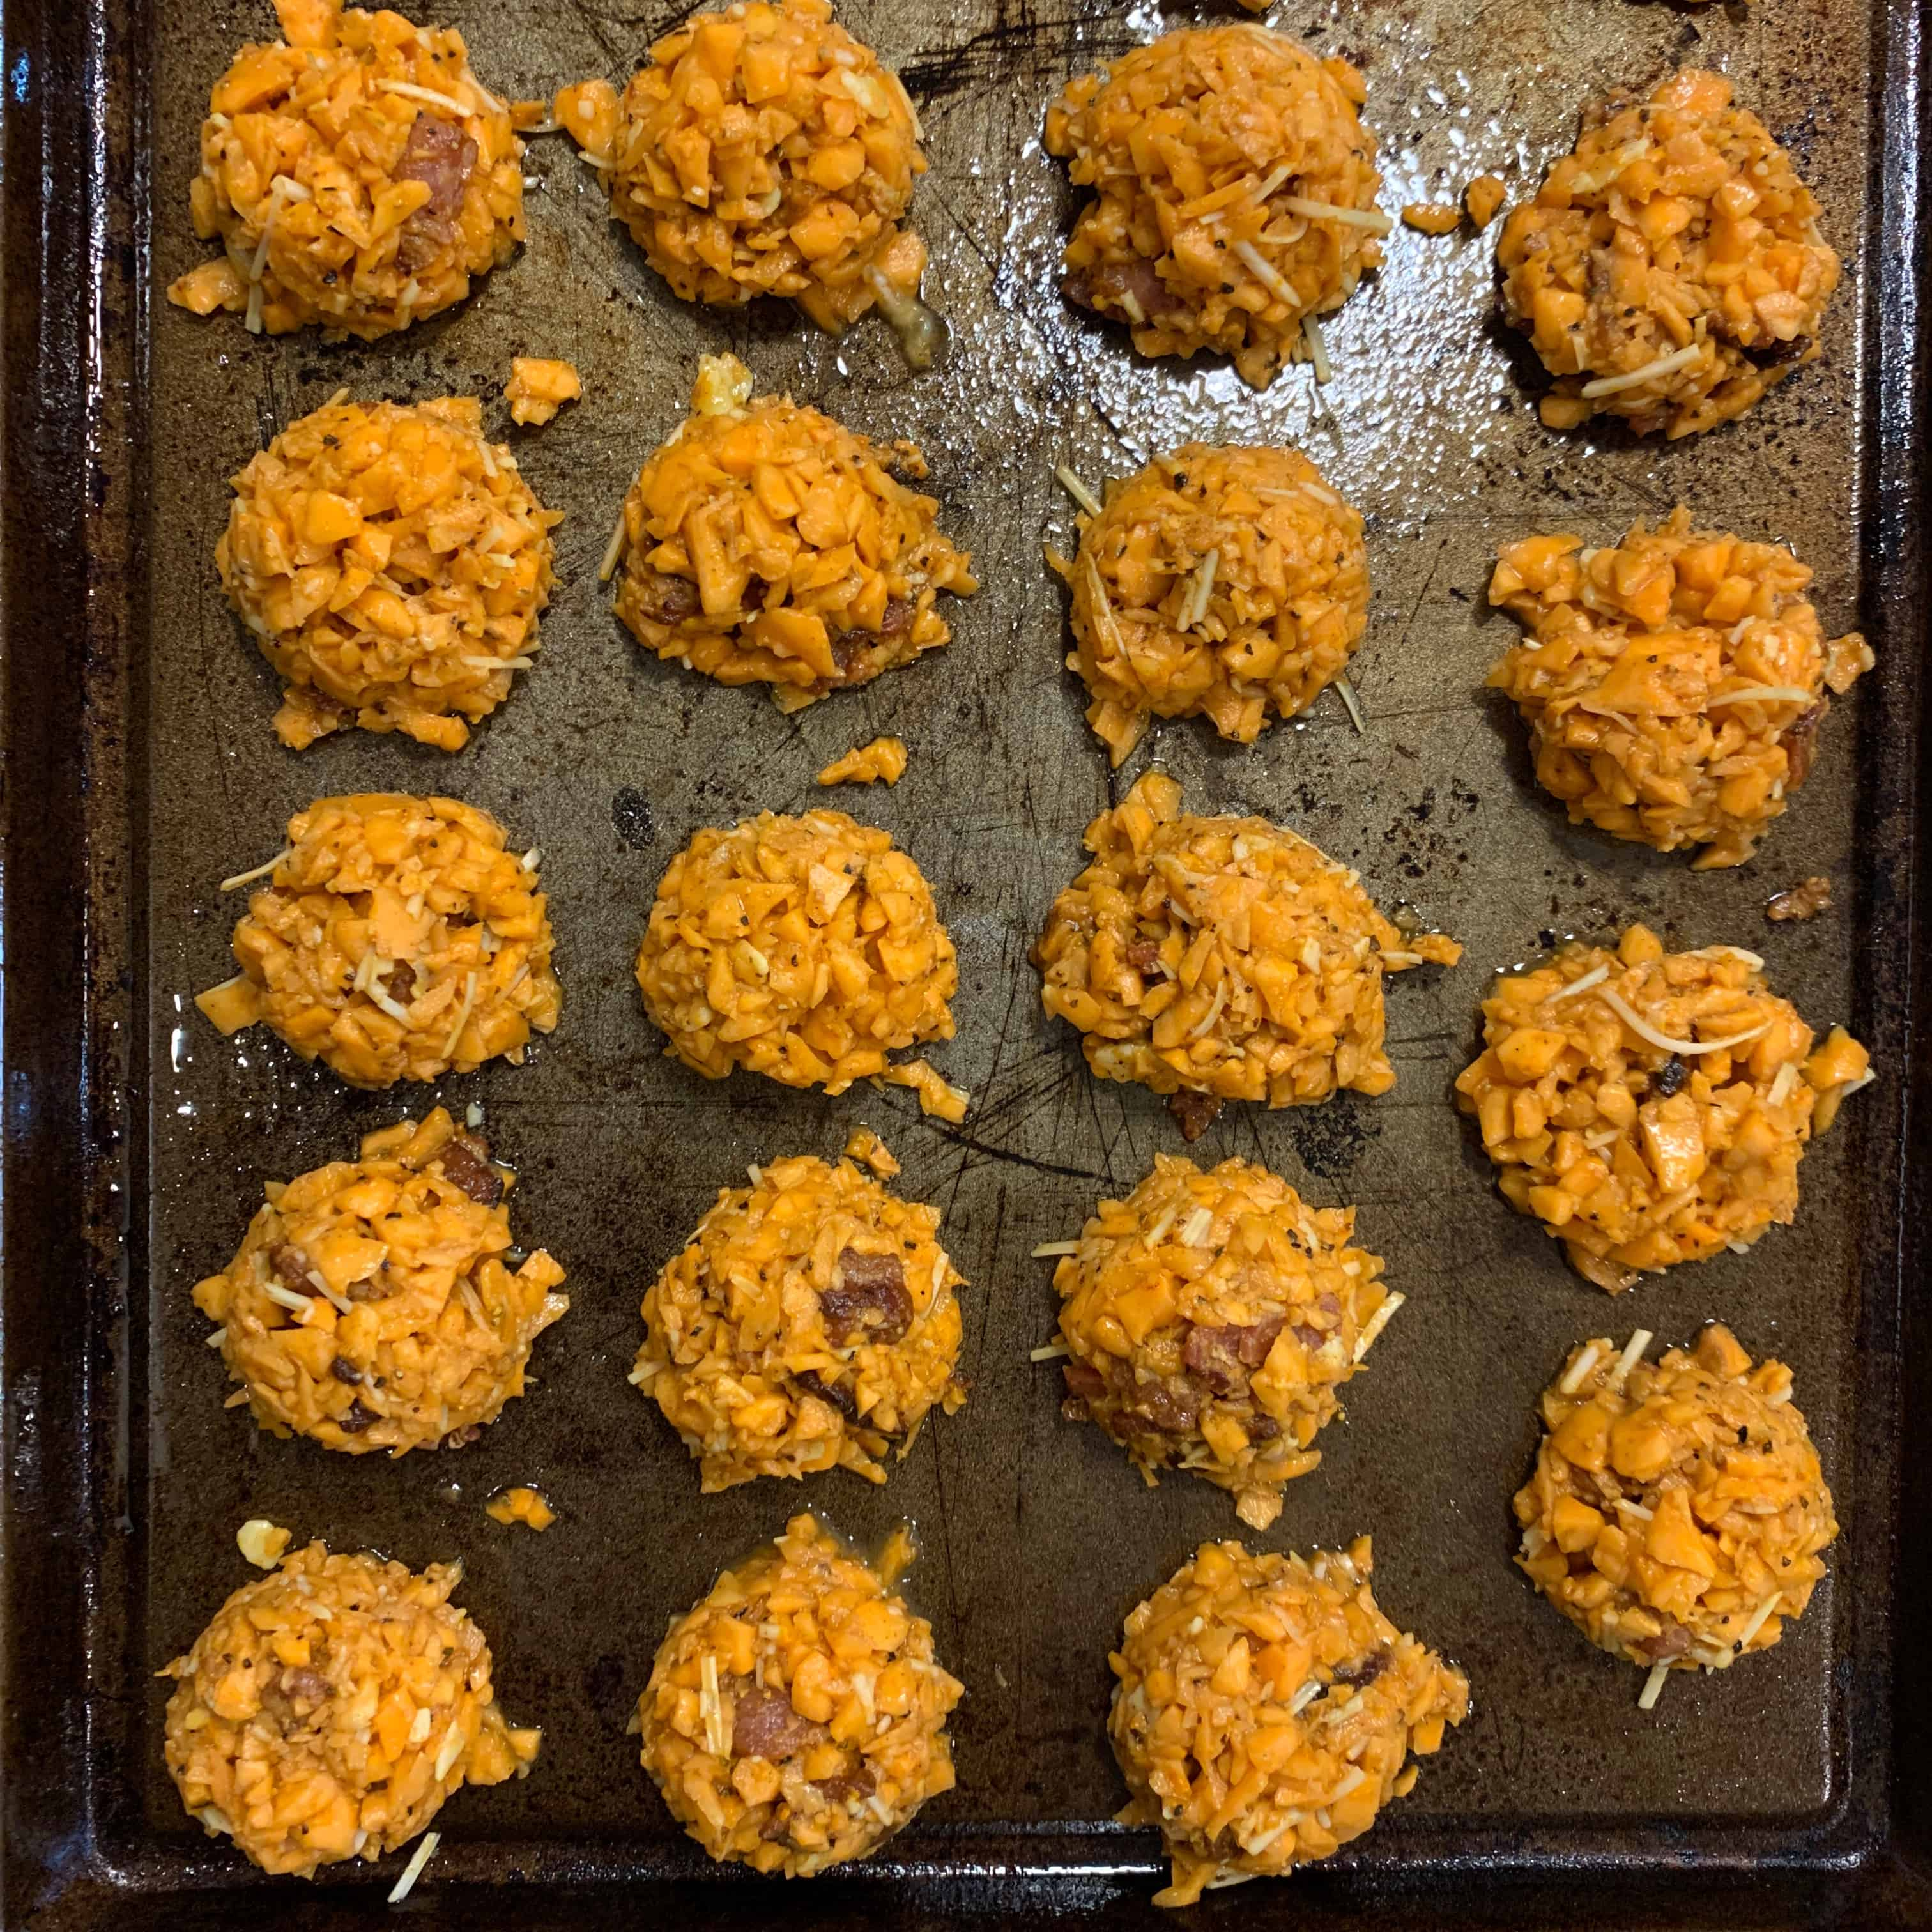 sweet potato tots on a baking sheet before baking